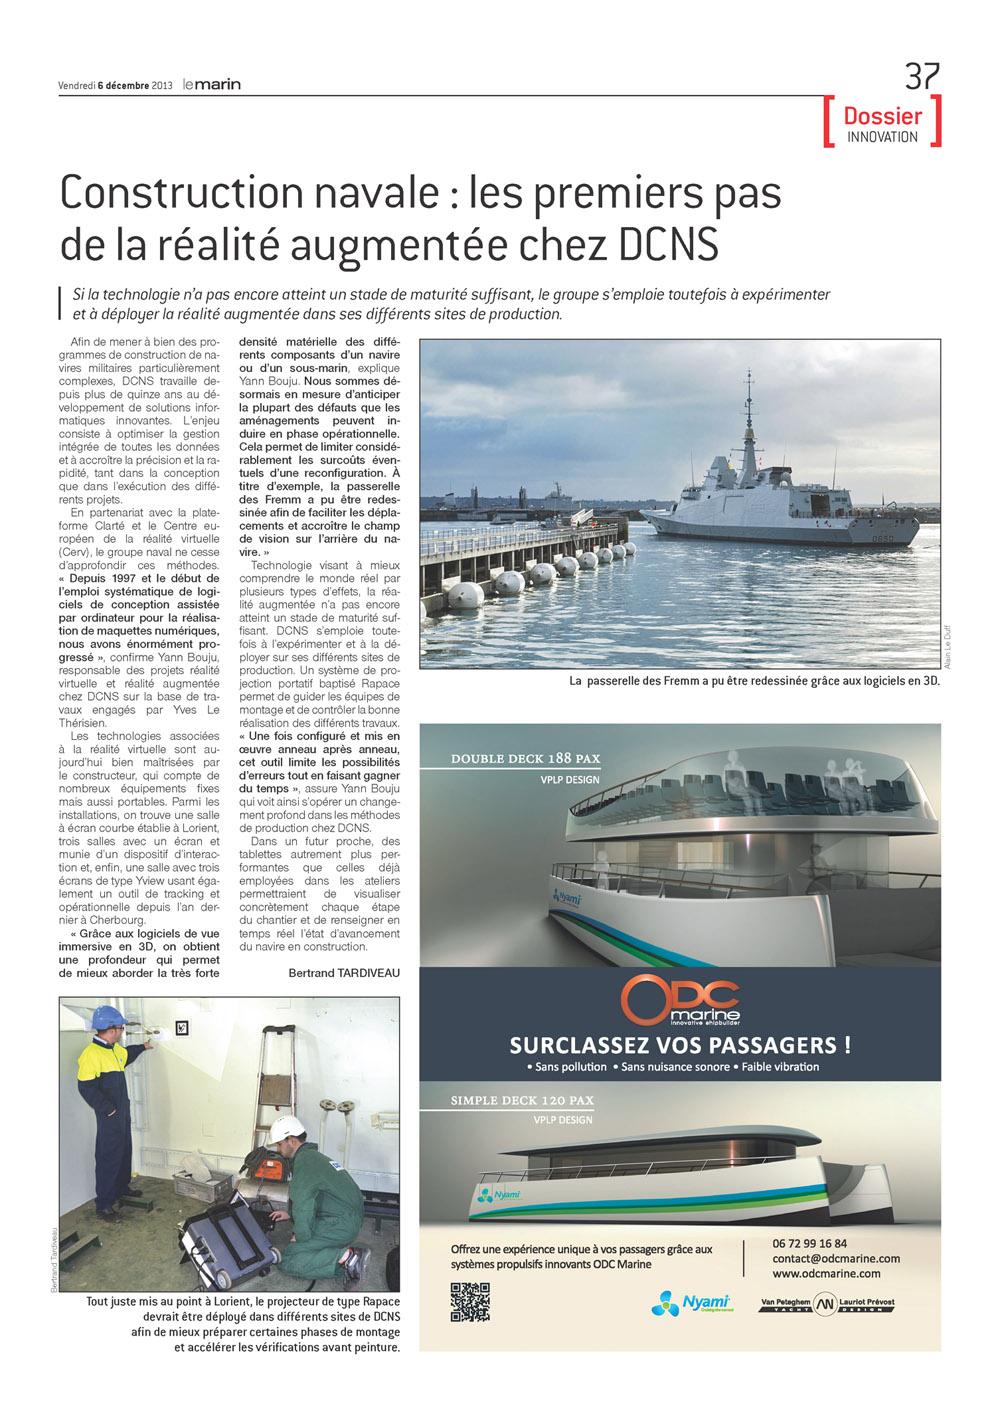 Le Marin (Catamaran VPLP)